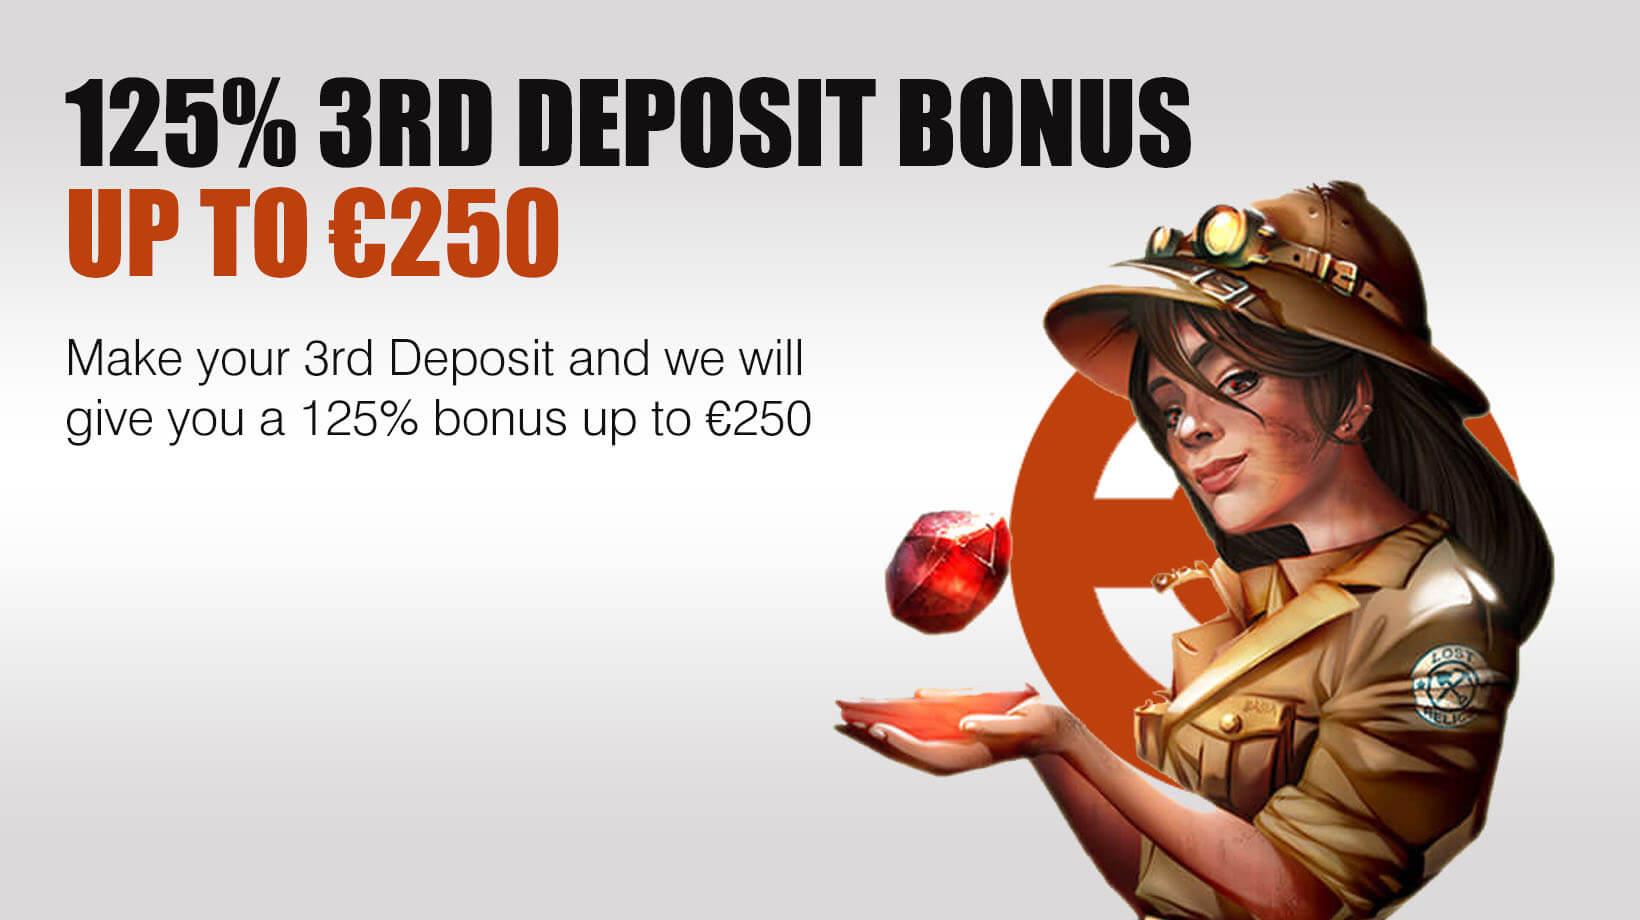 125% 3rd Deposit Bonus